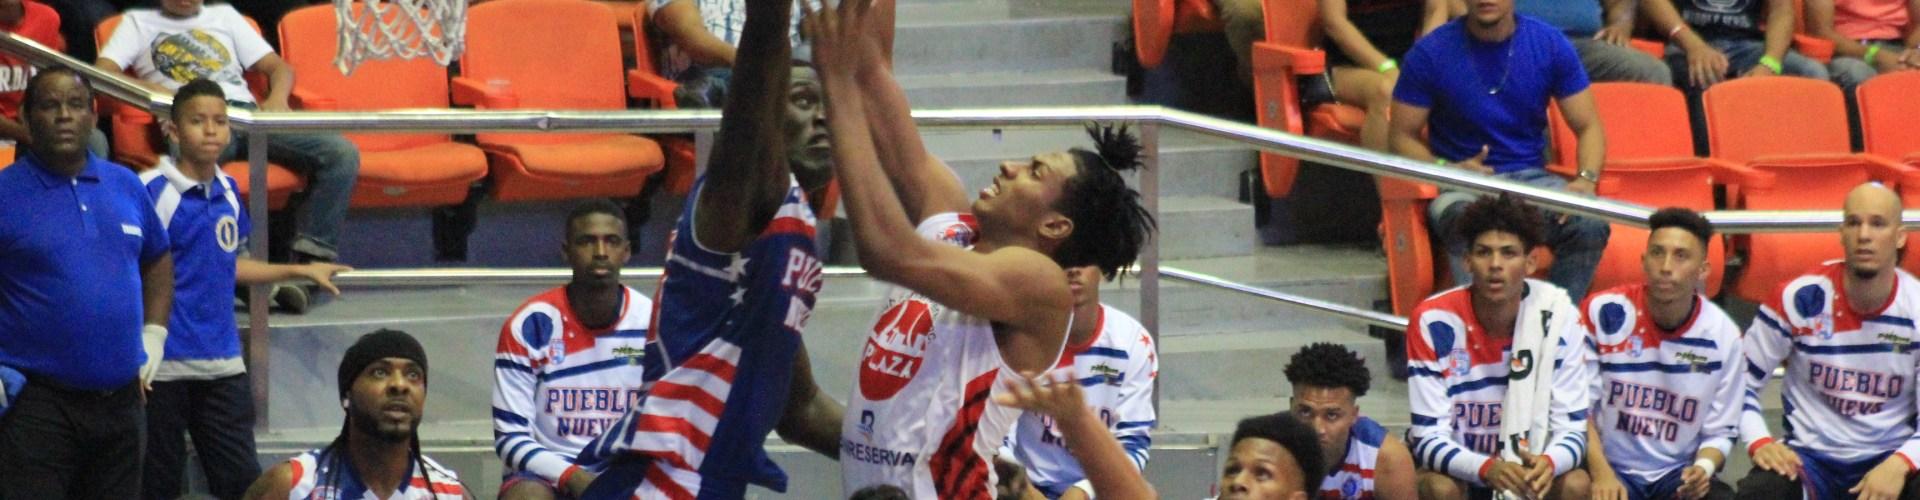 PN y CDP a final torneo baloncesto